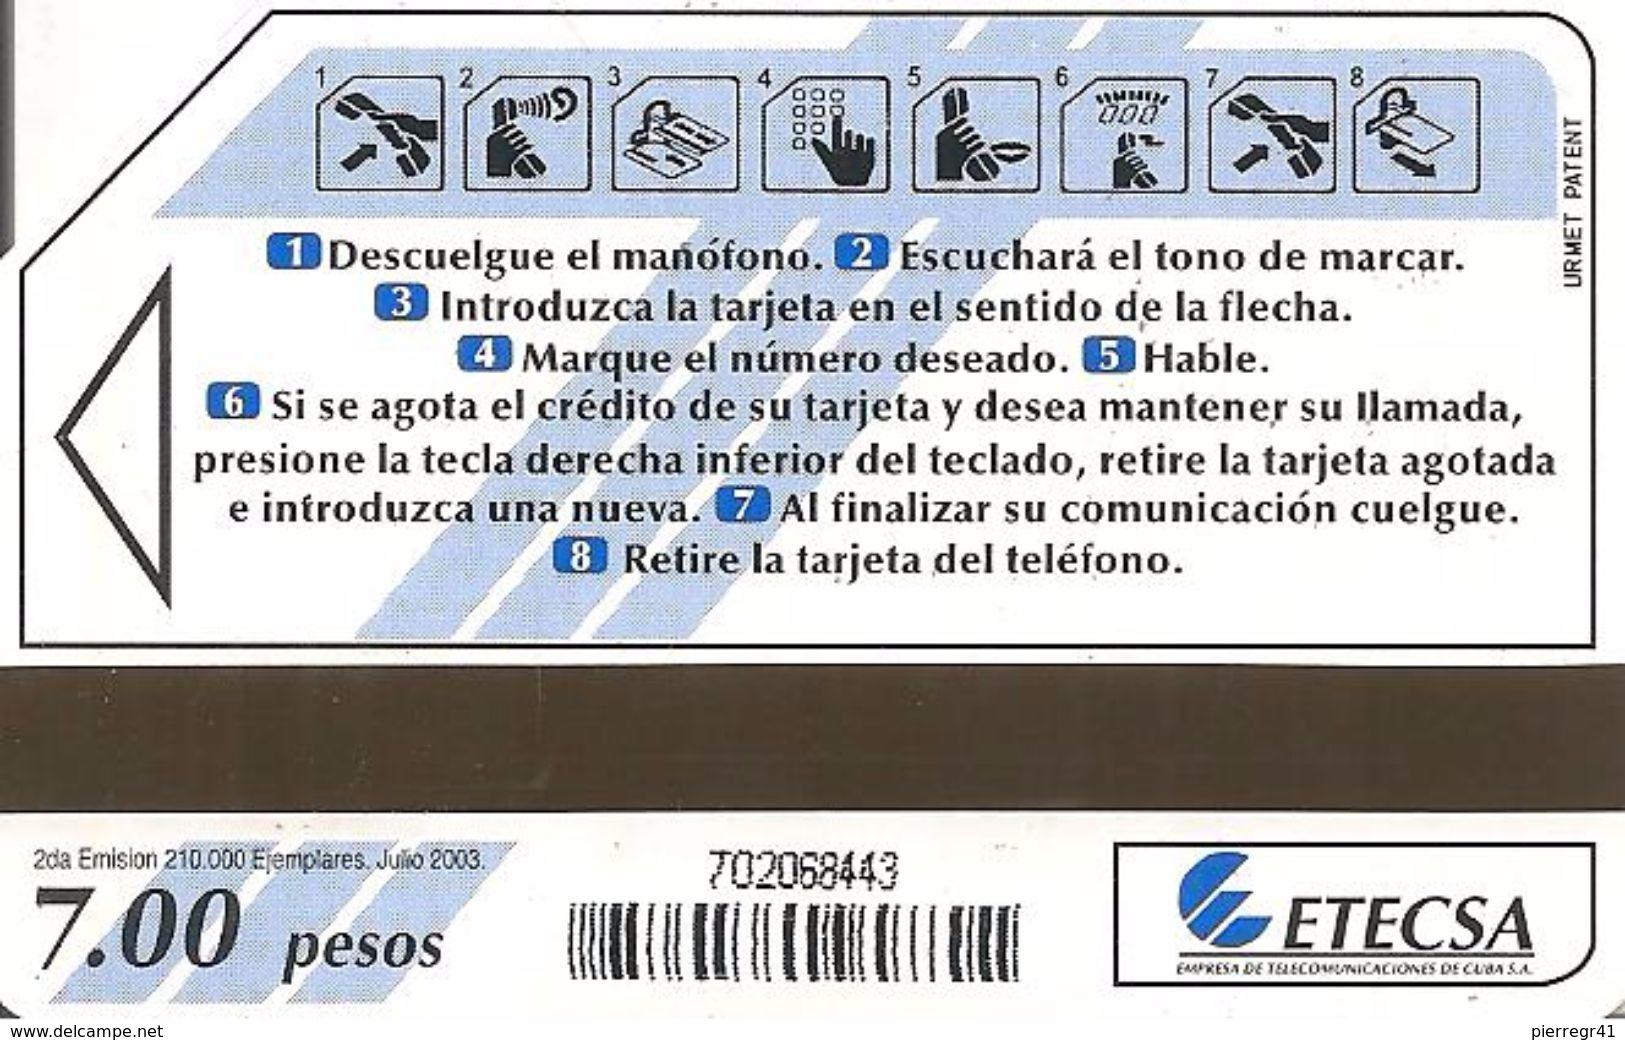 CARTE-MAGNETIQUE CUBA ETECSA-7 Pesos -07/2003-UTILISE-TBE - Cuba